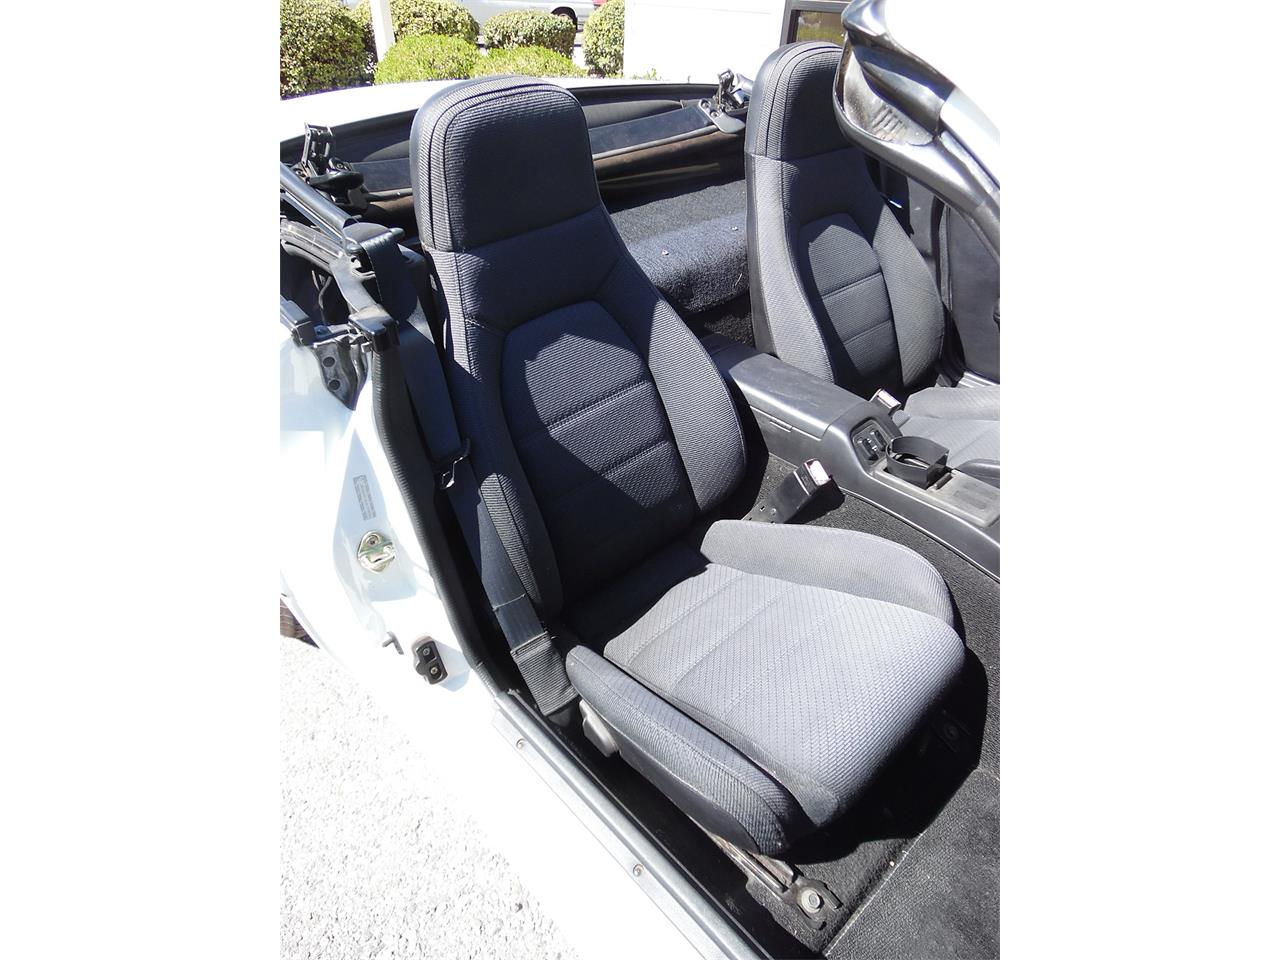 Large Picture of 1990 Mazda Miata located in Redlands California - $9,995.00 - PVWW